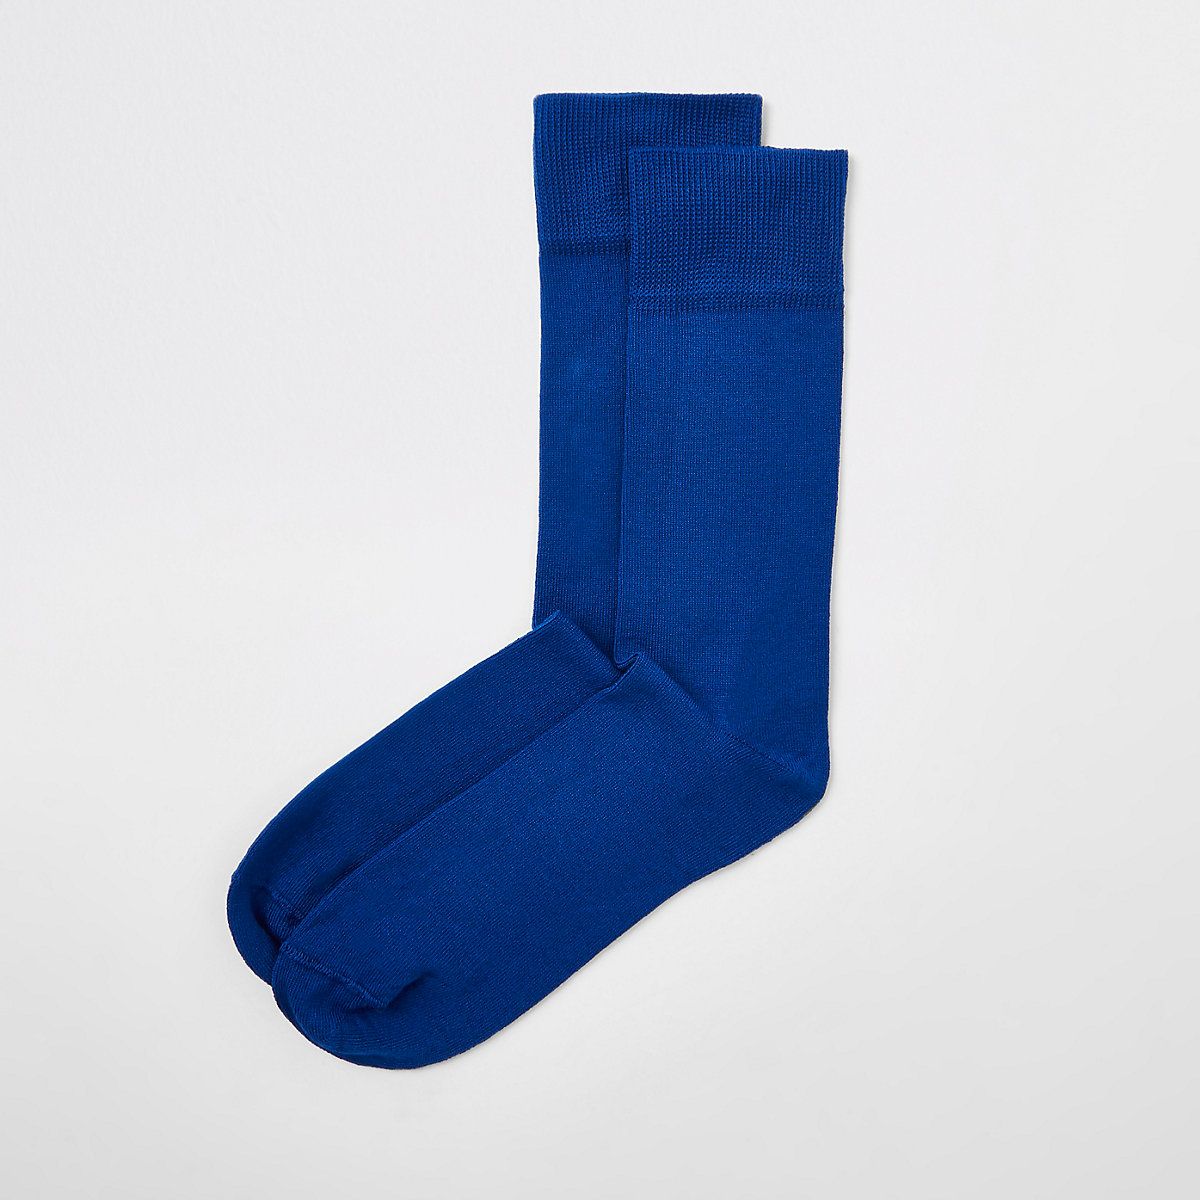 Blue smart socks